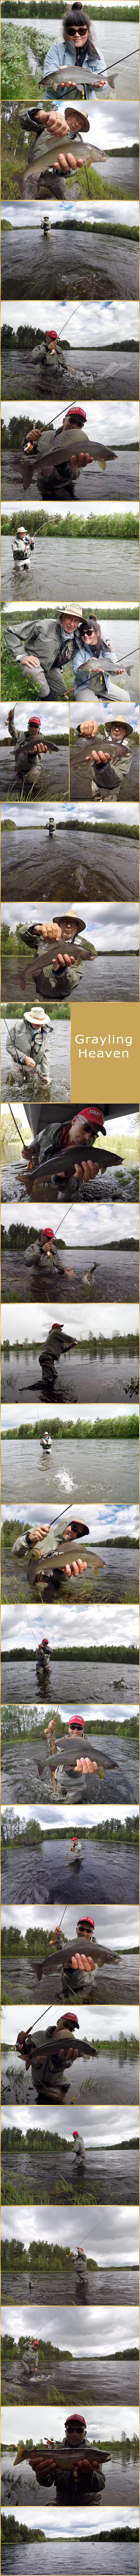 flyfishing trips Ziesche